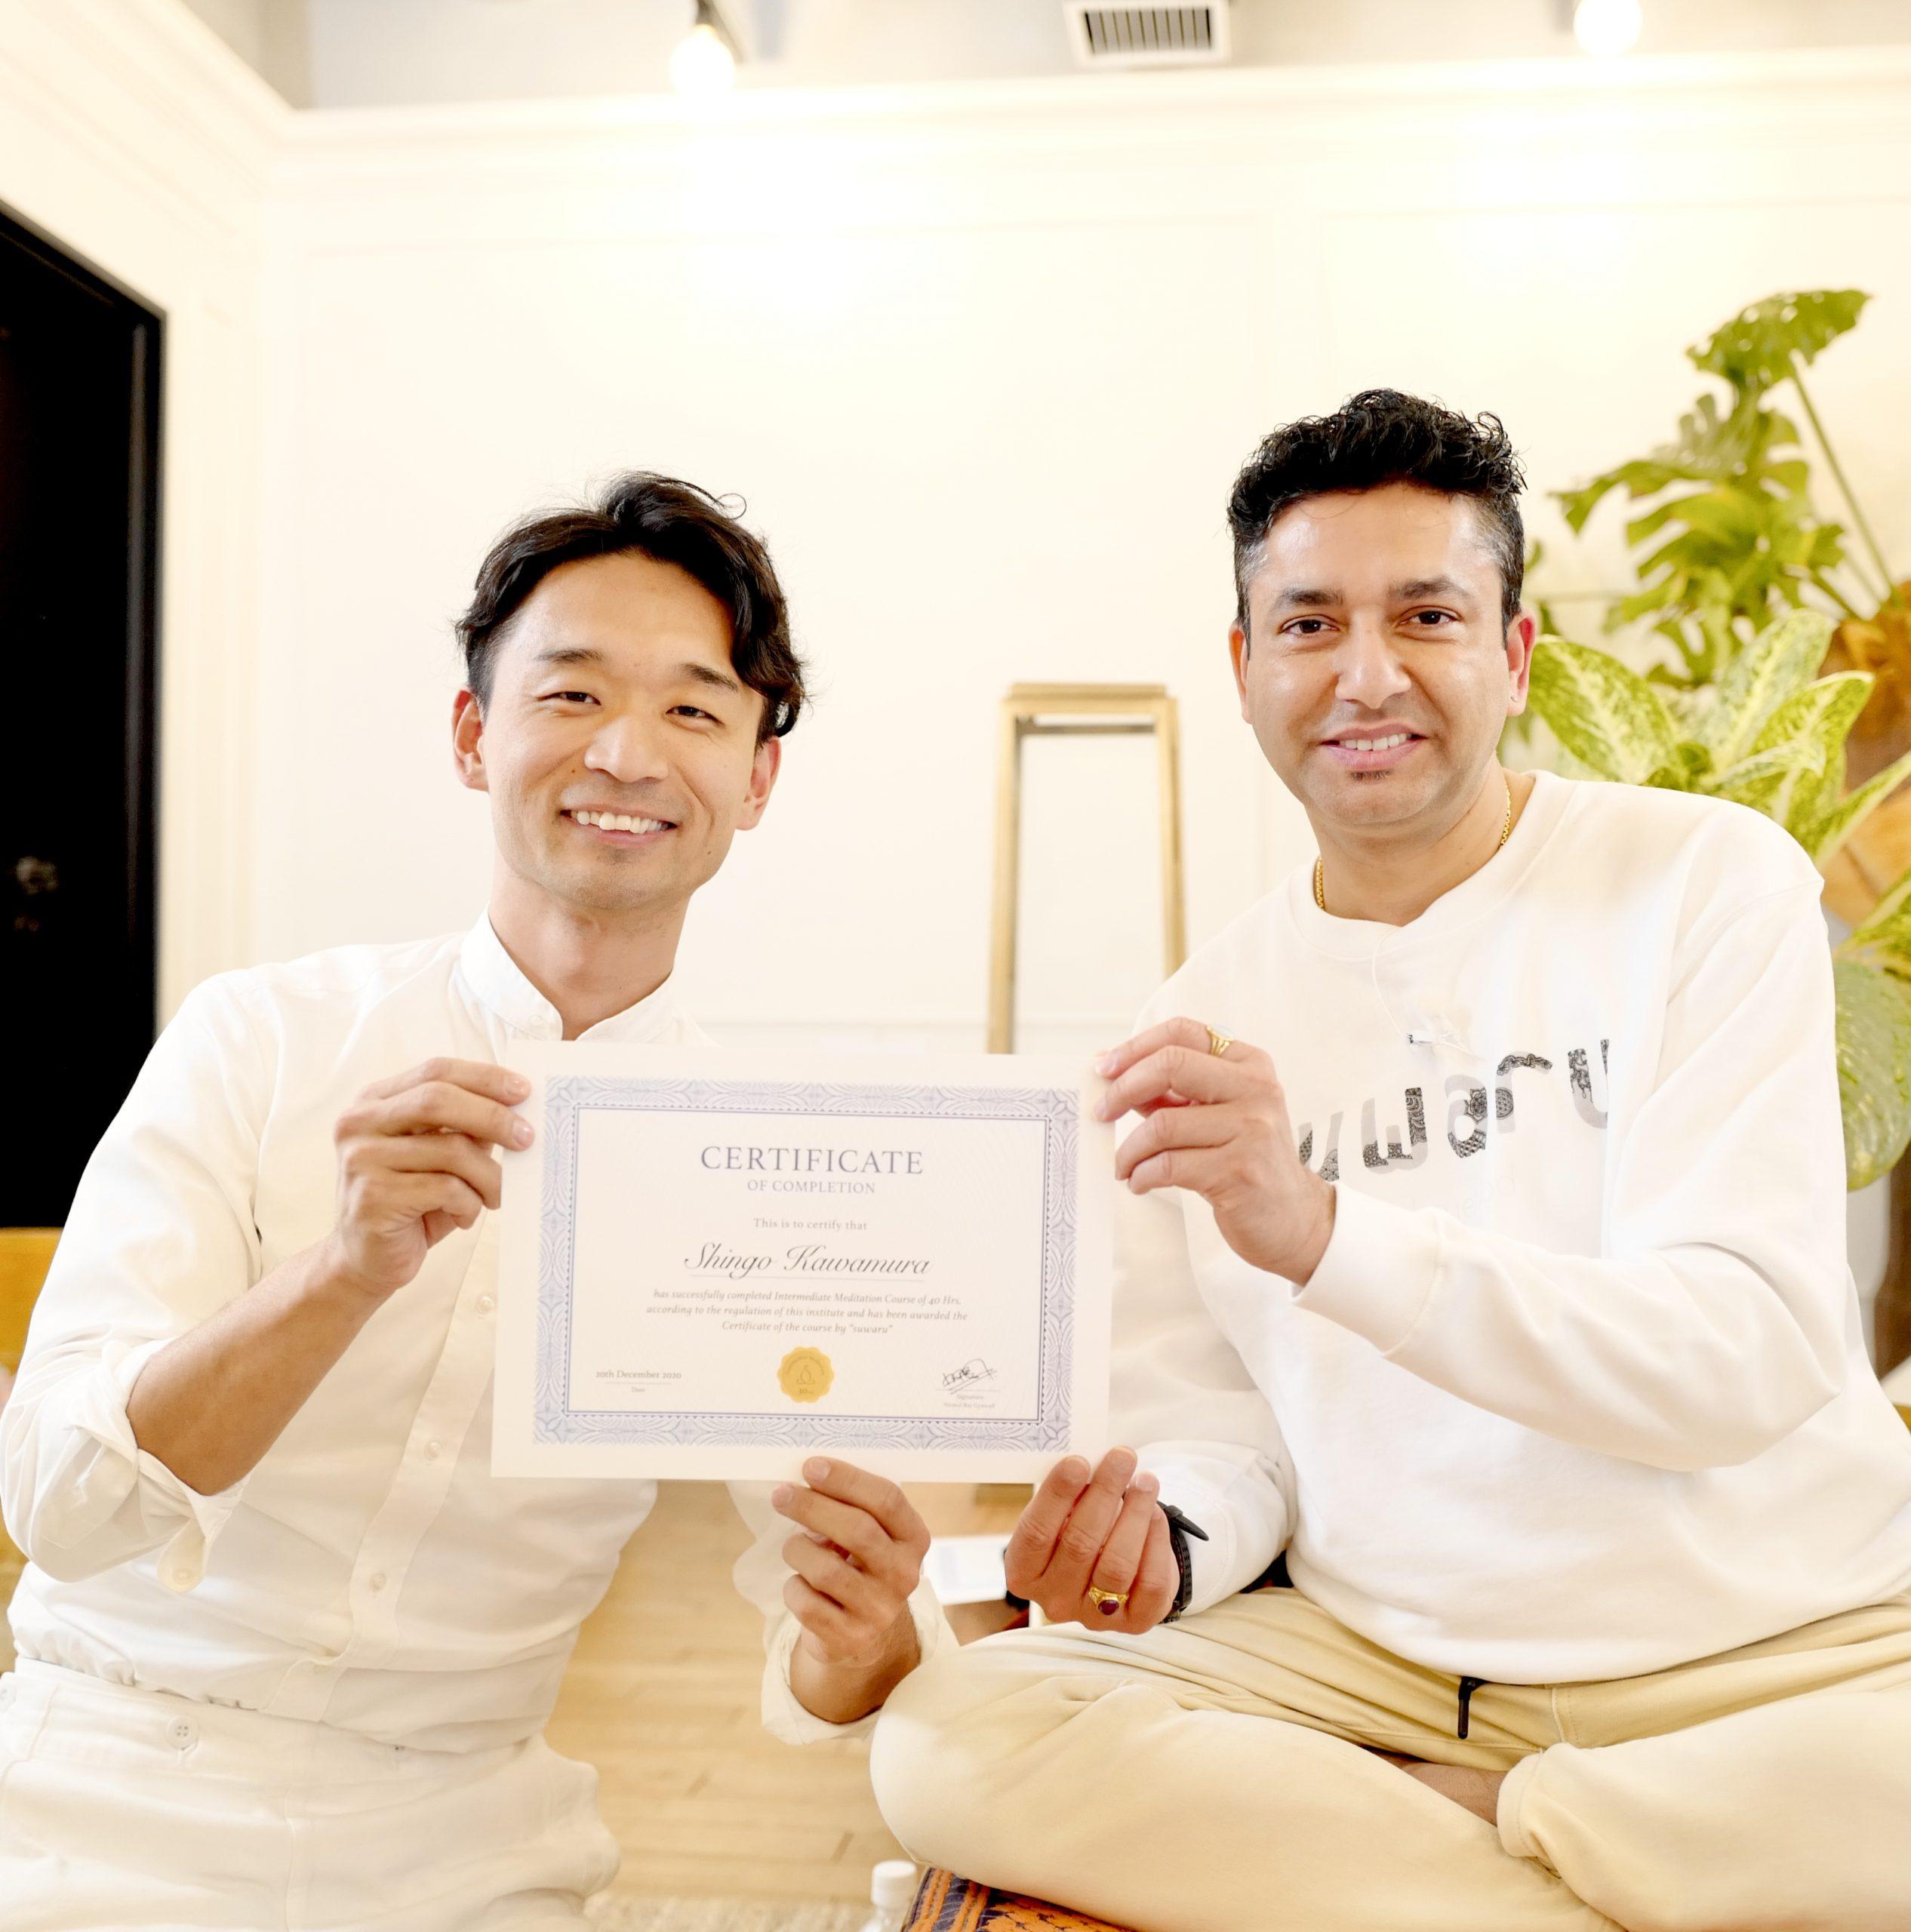 suwaru スキンケア|スワル広尾瞑想マインドフルネス|ニーマル先生